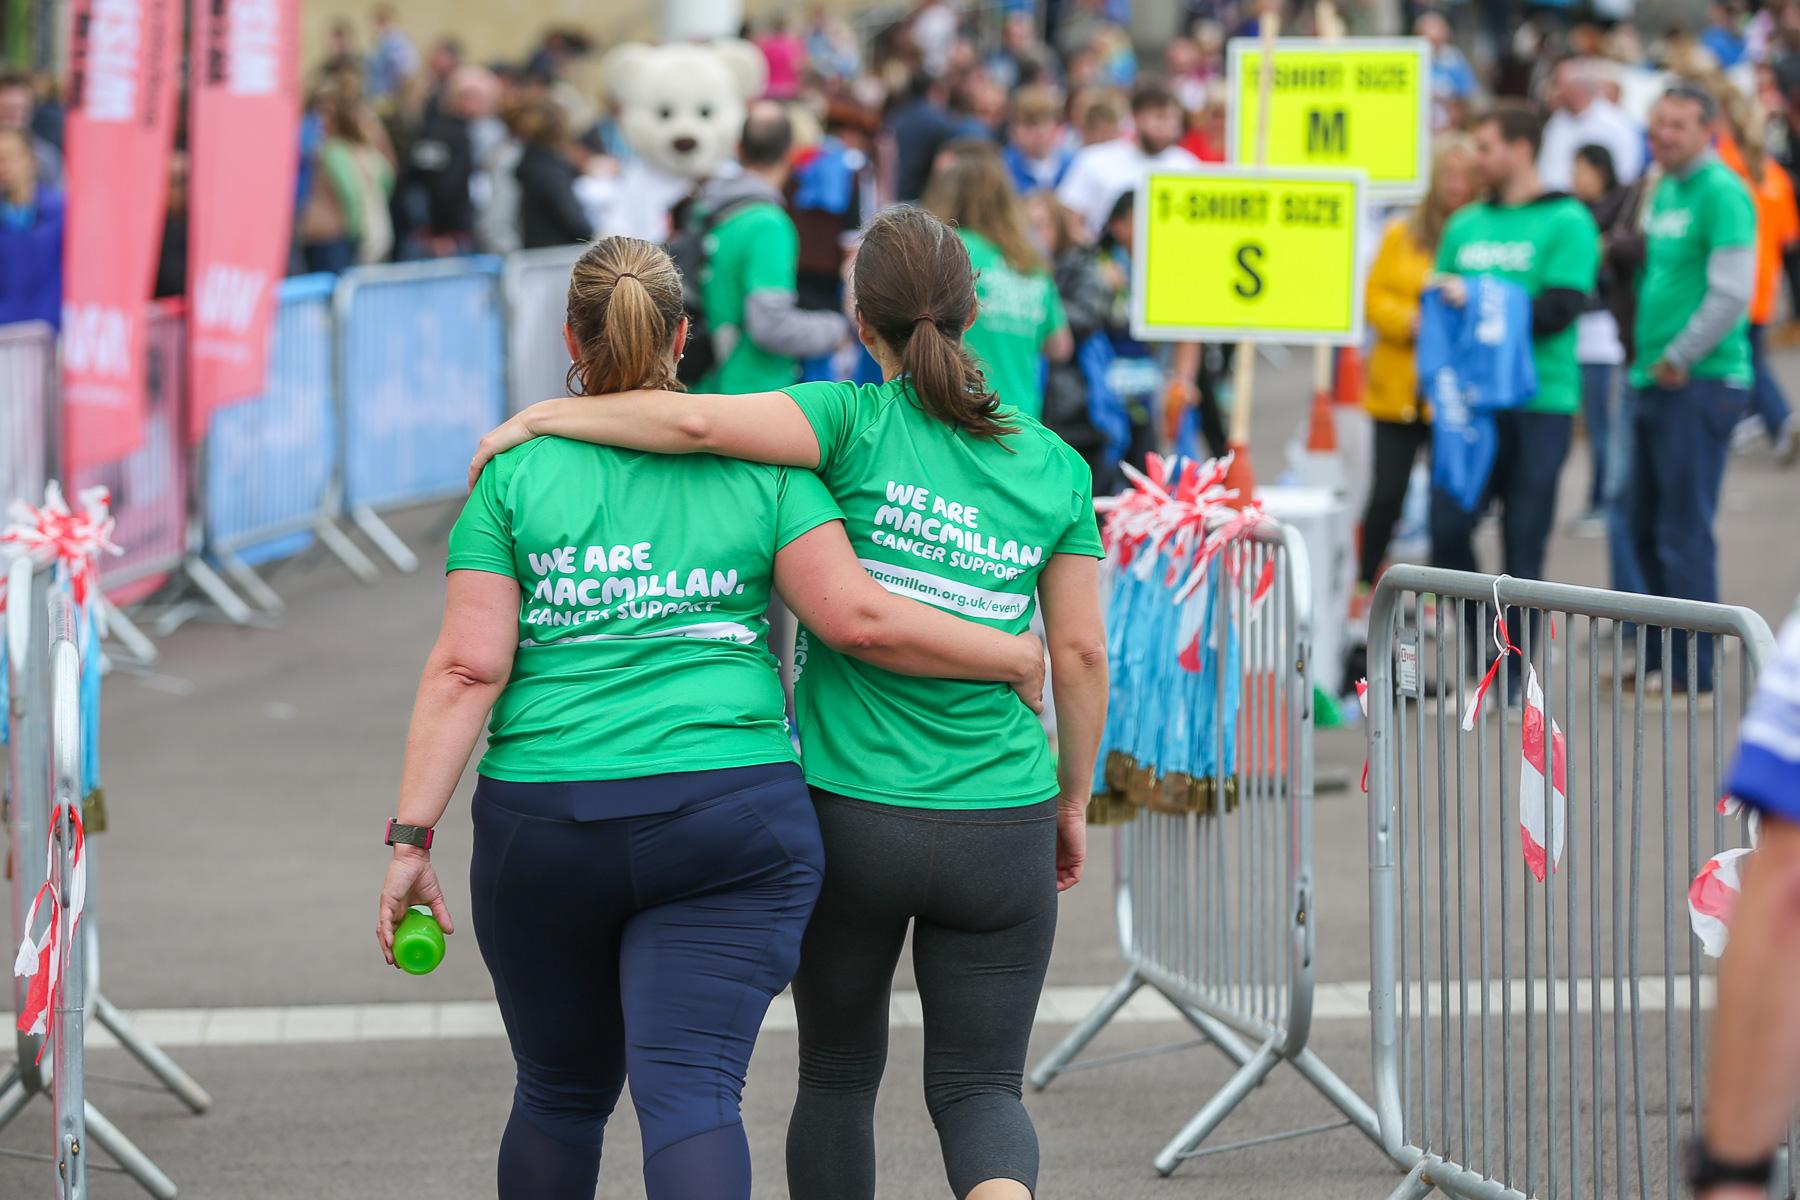 Macmillan-charity-marathon-run-cheltenham-racecourse-september-2018-natalia-smith-photography0341.jpg